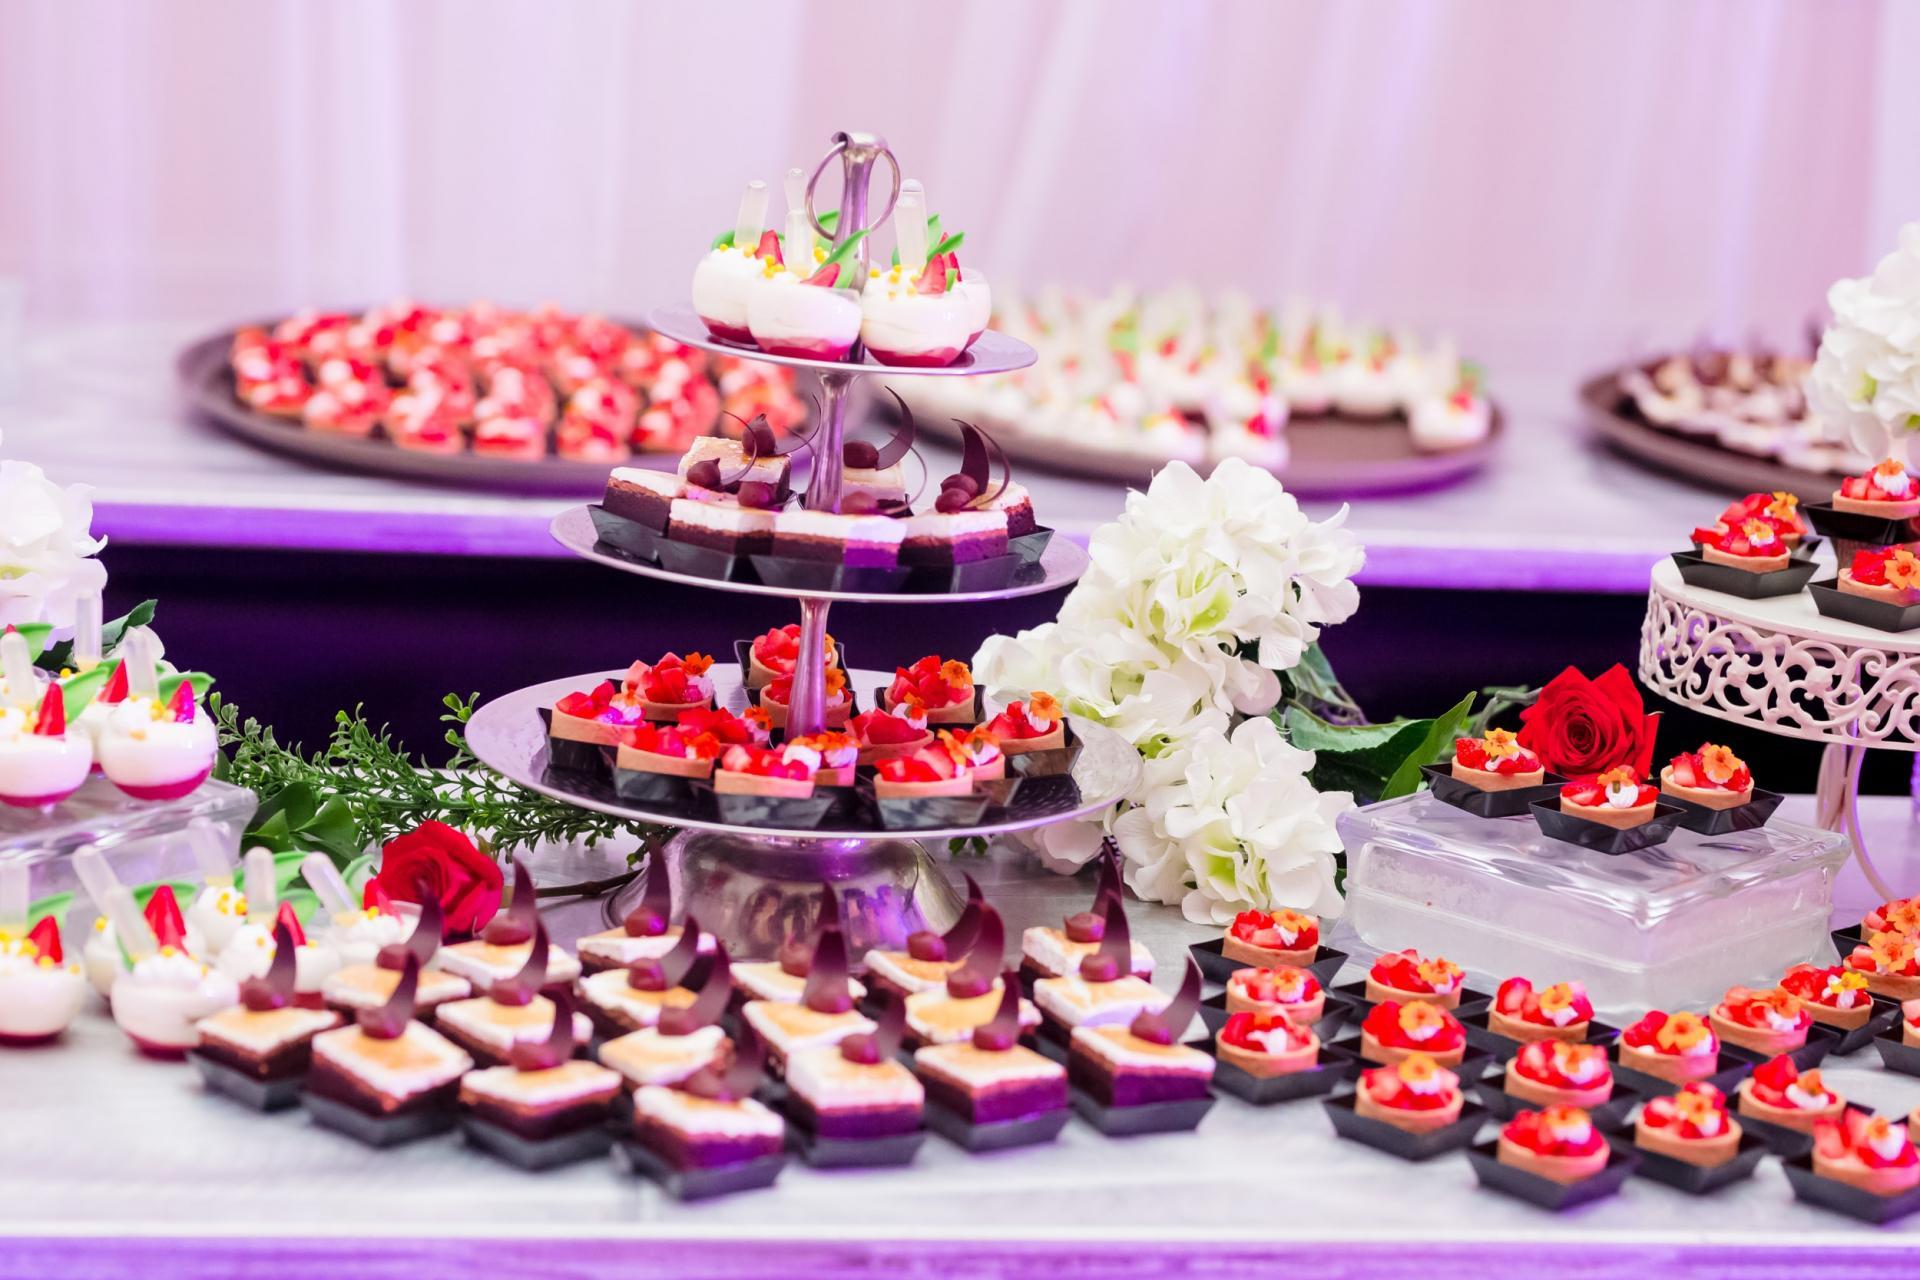 Cake by Franck desserts at Sip-Savor-Swagger-min